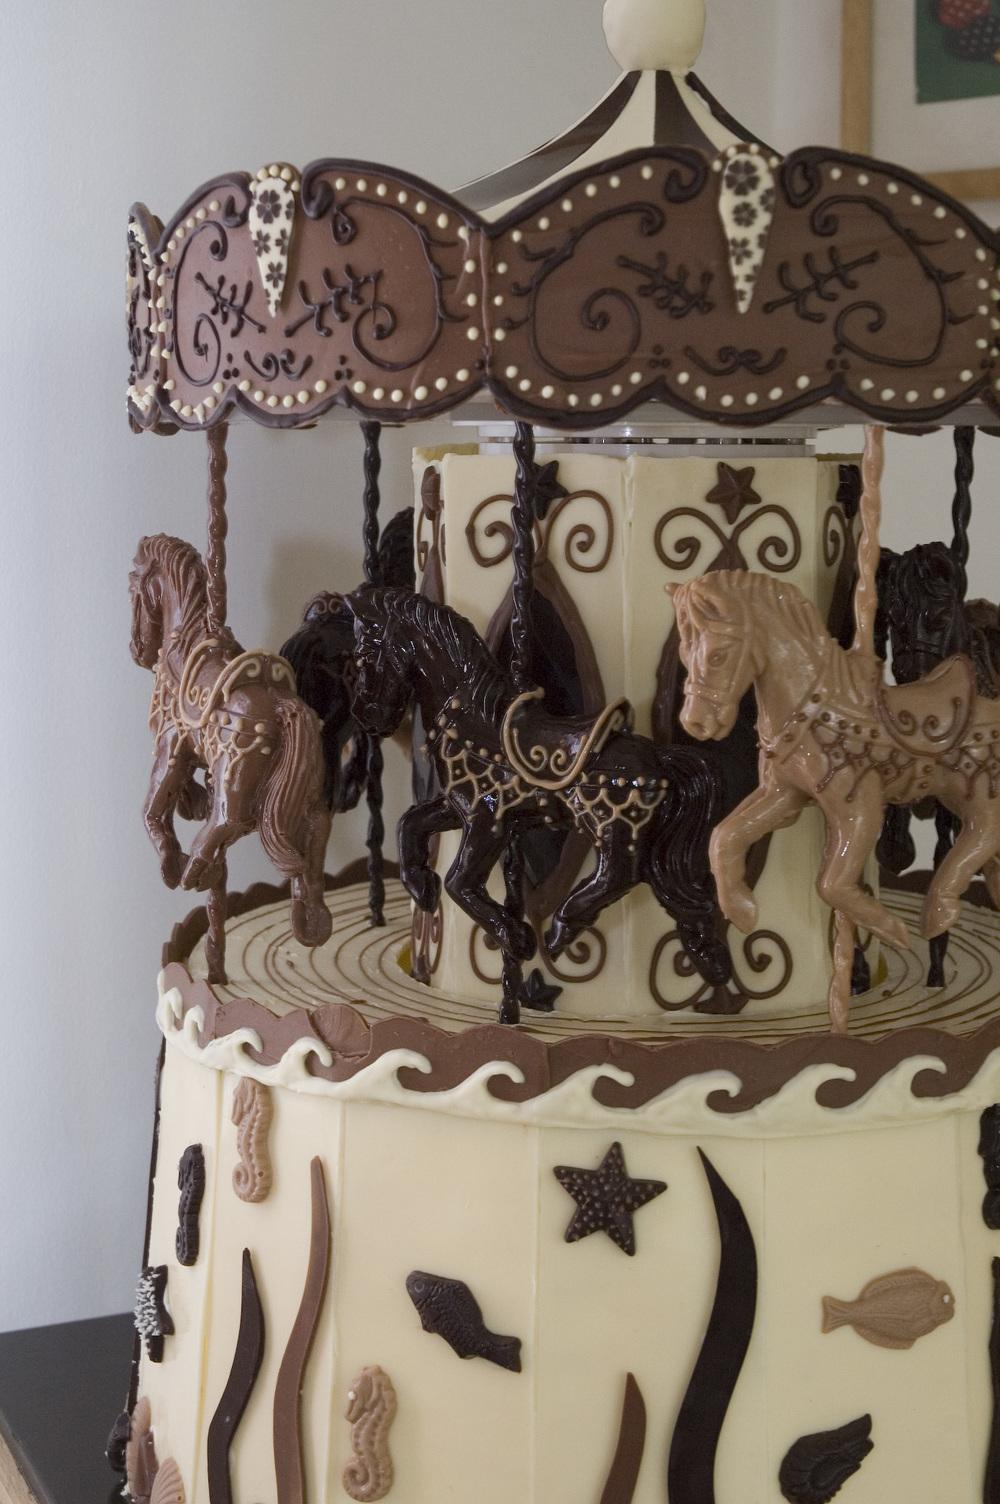 shebakes_chocolate_carousel_01.jpg